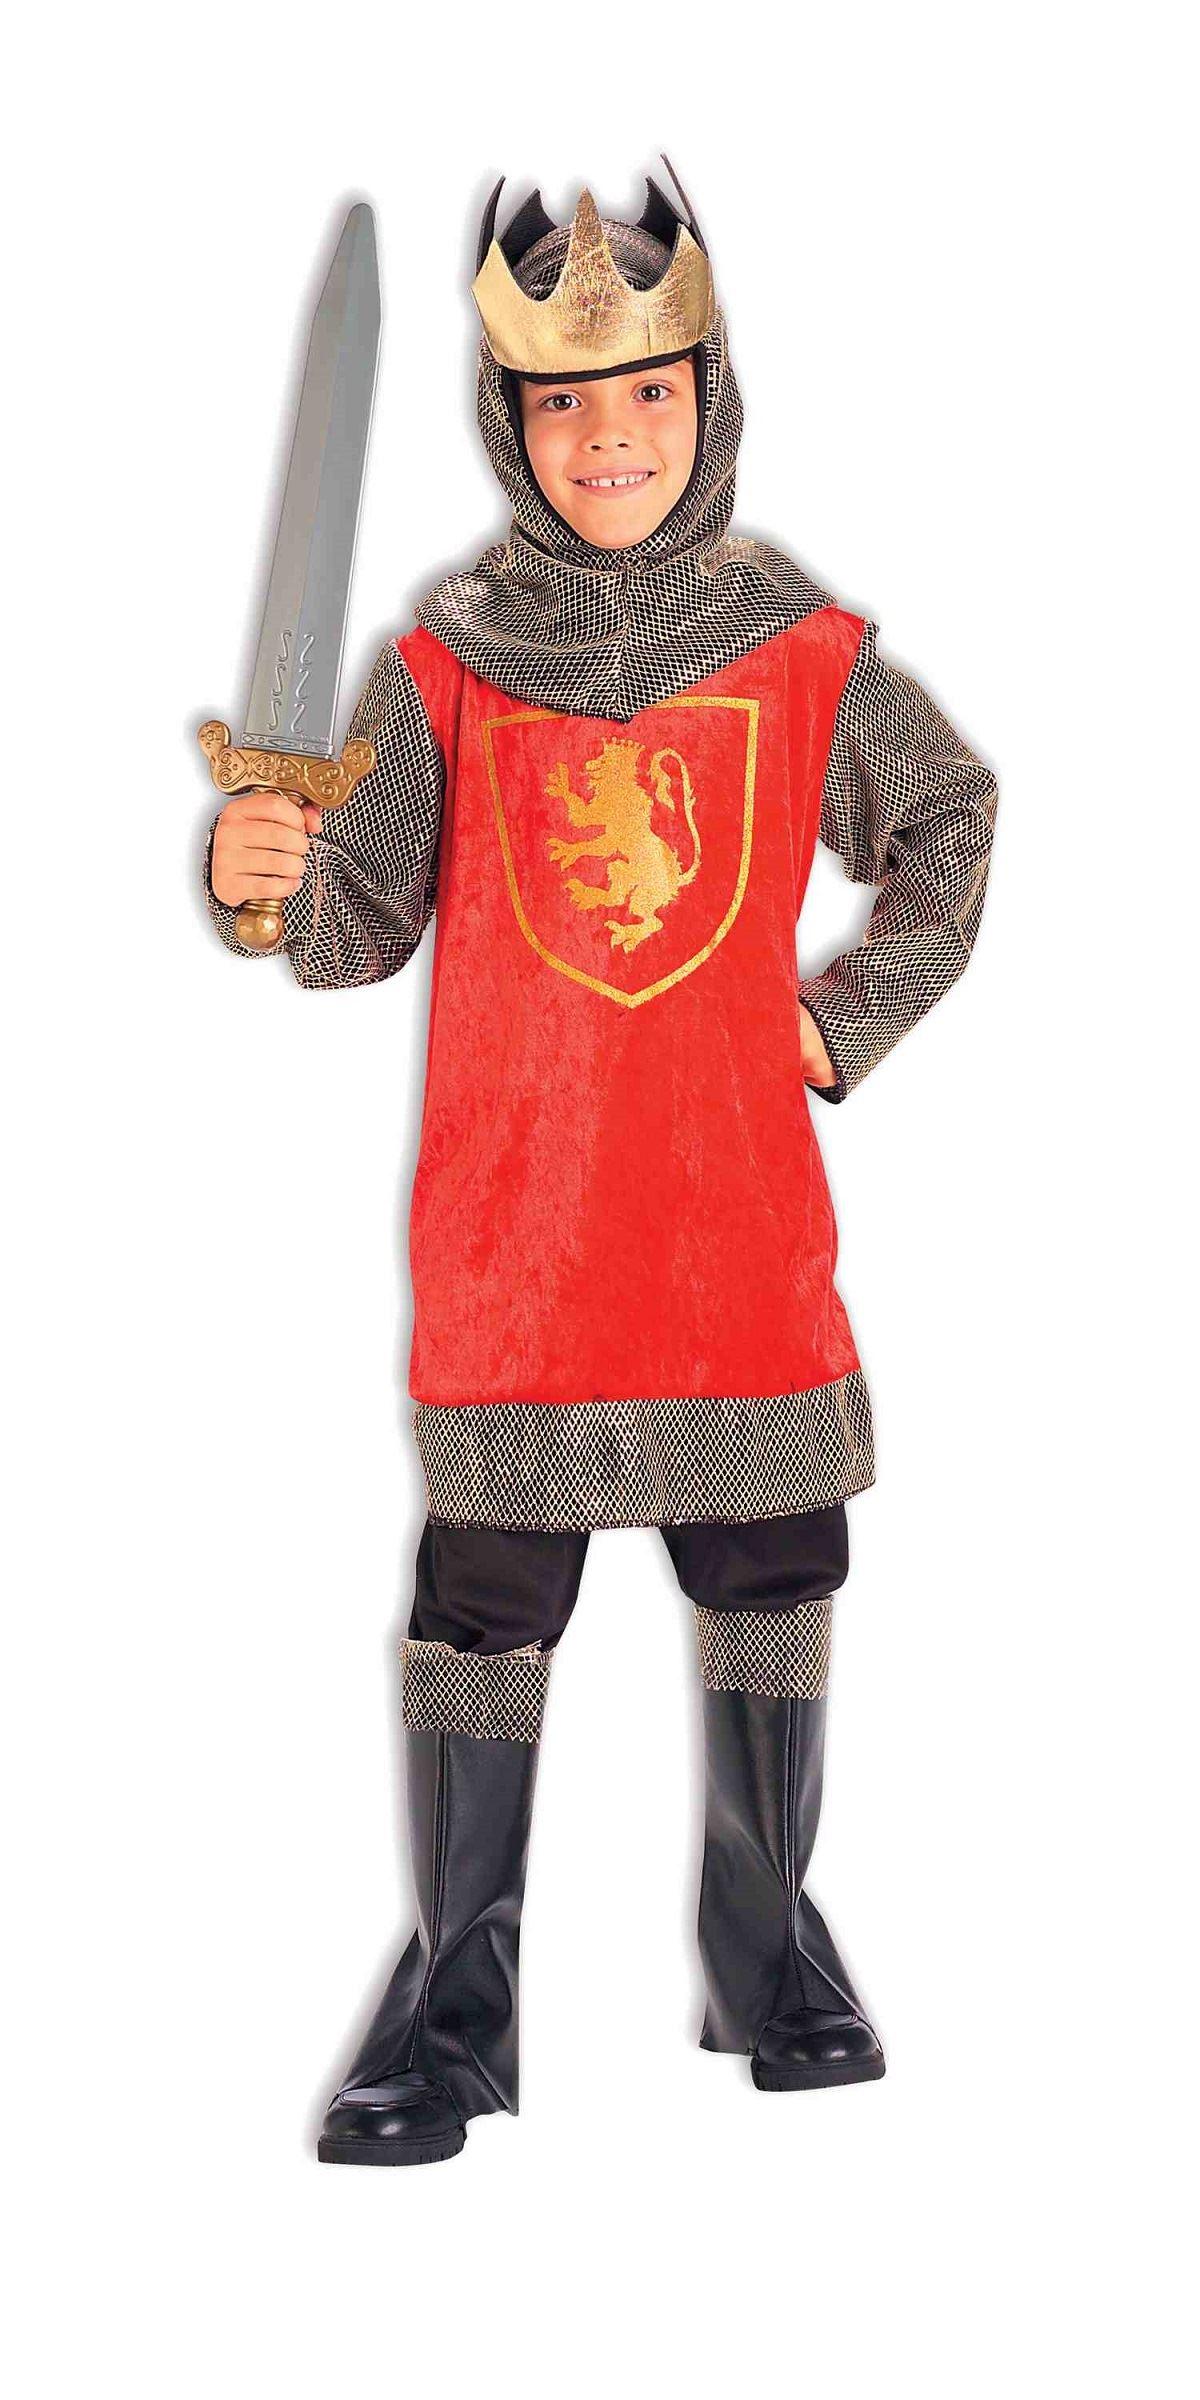 Kids Medieval King Boys Crusader Costume   $27.99   The Costume Land